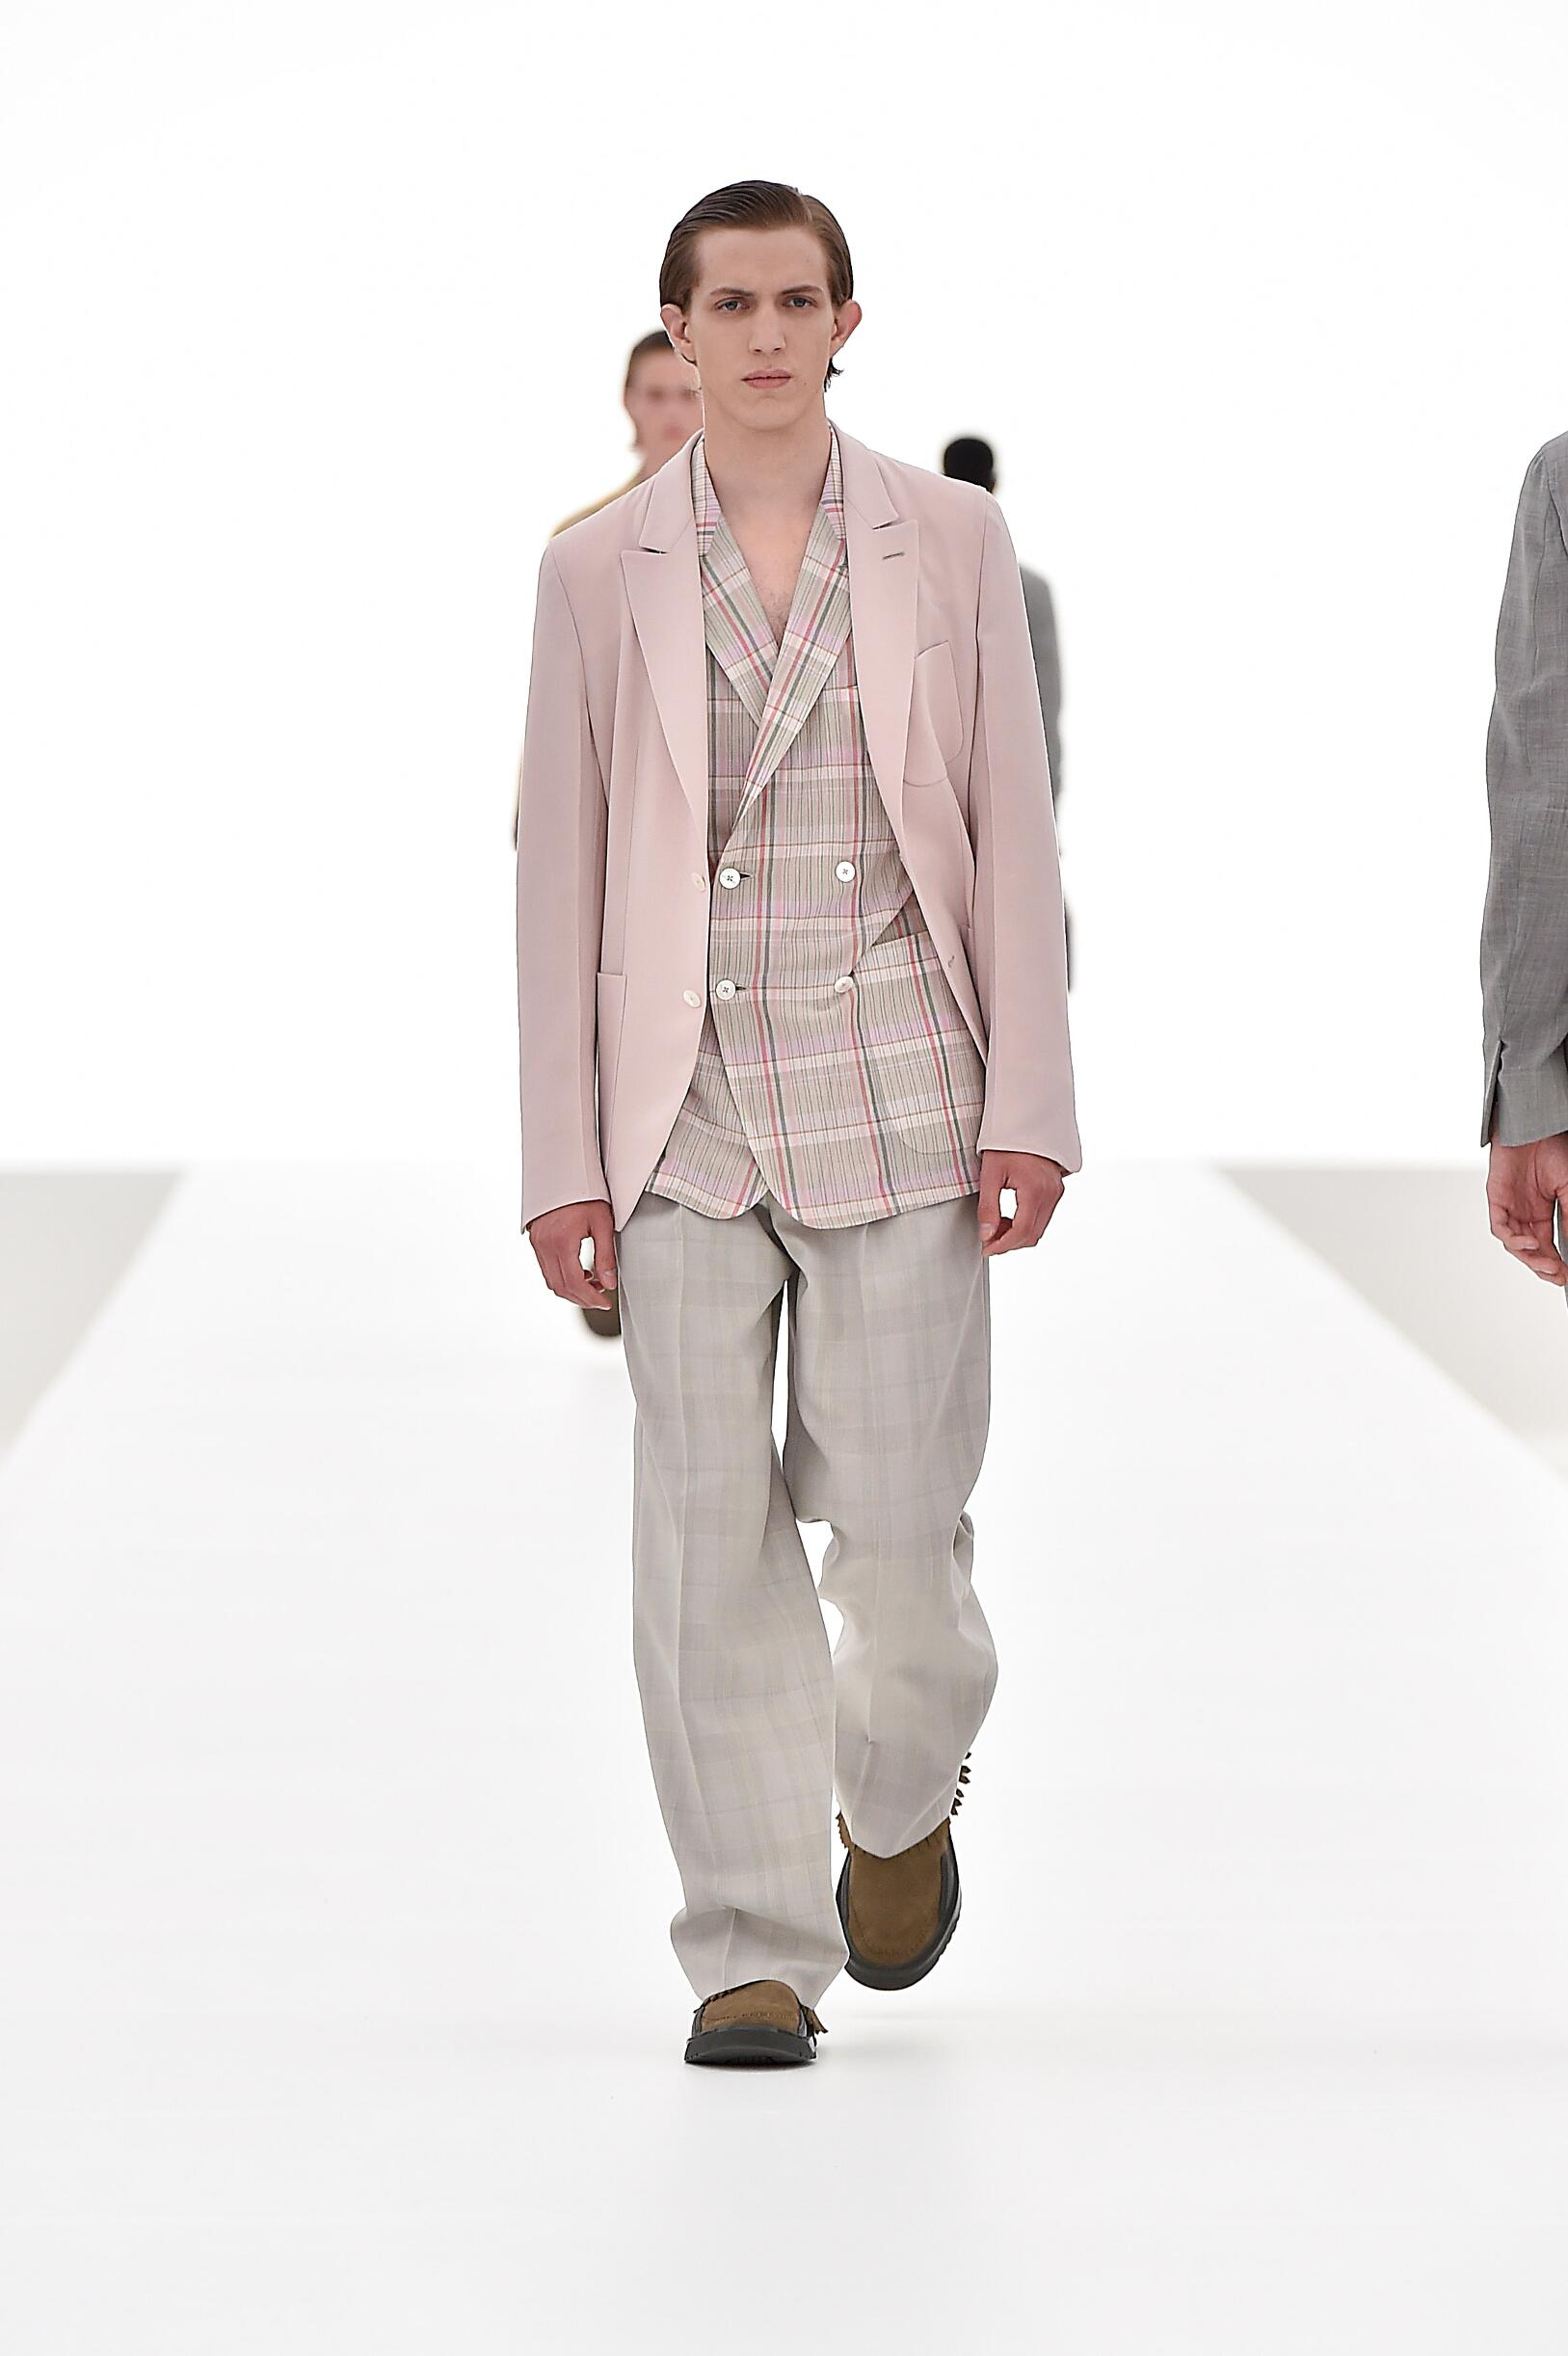 2016 Fashion Man Model Ermenegildo Zegna Couture Collection Catwalk